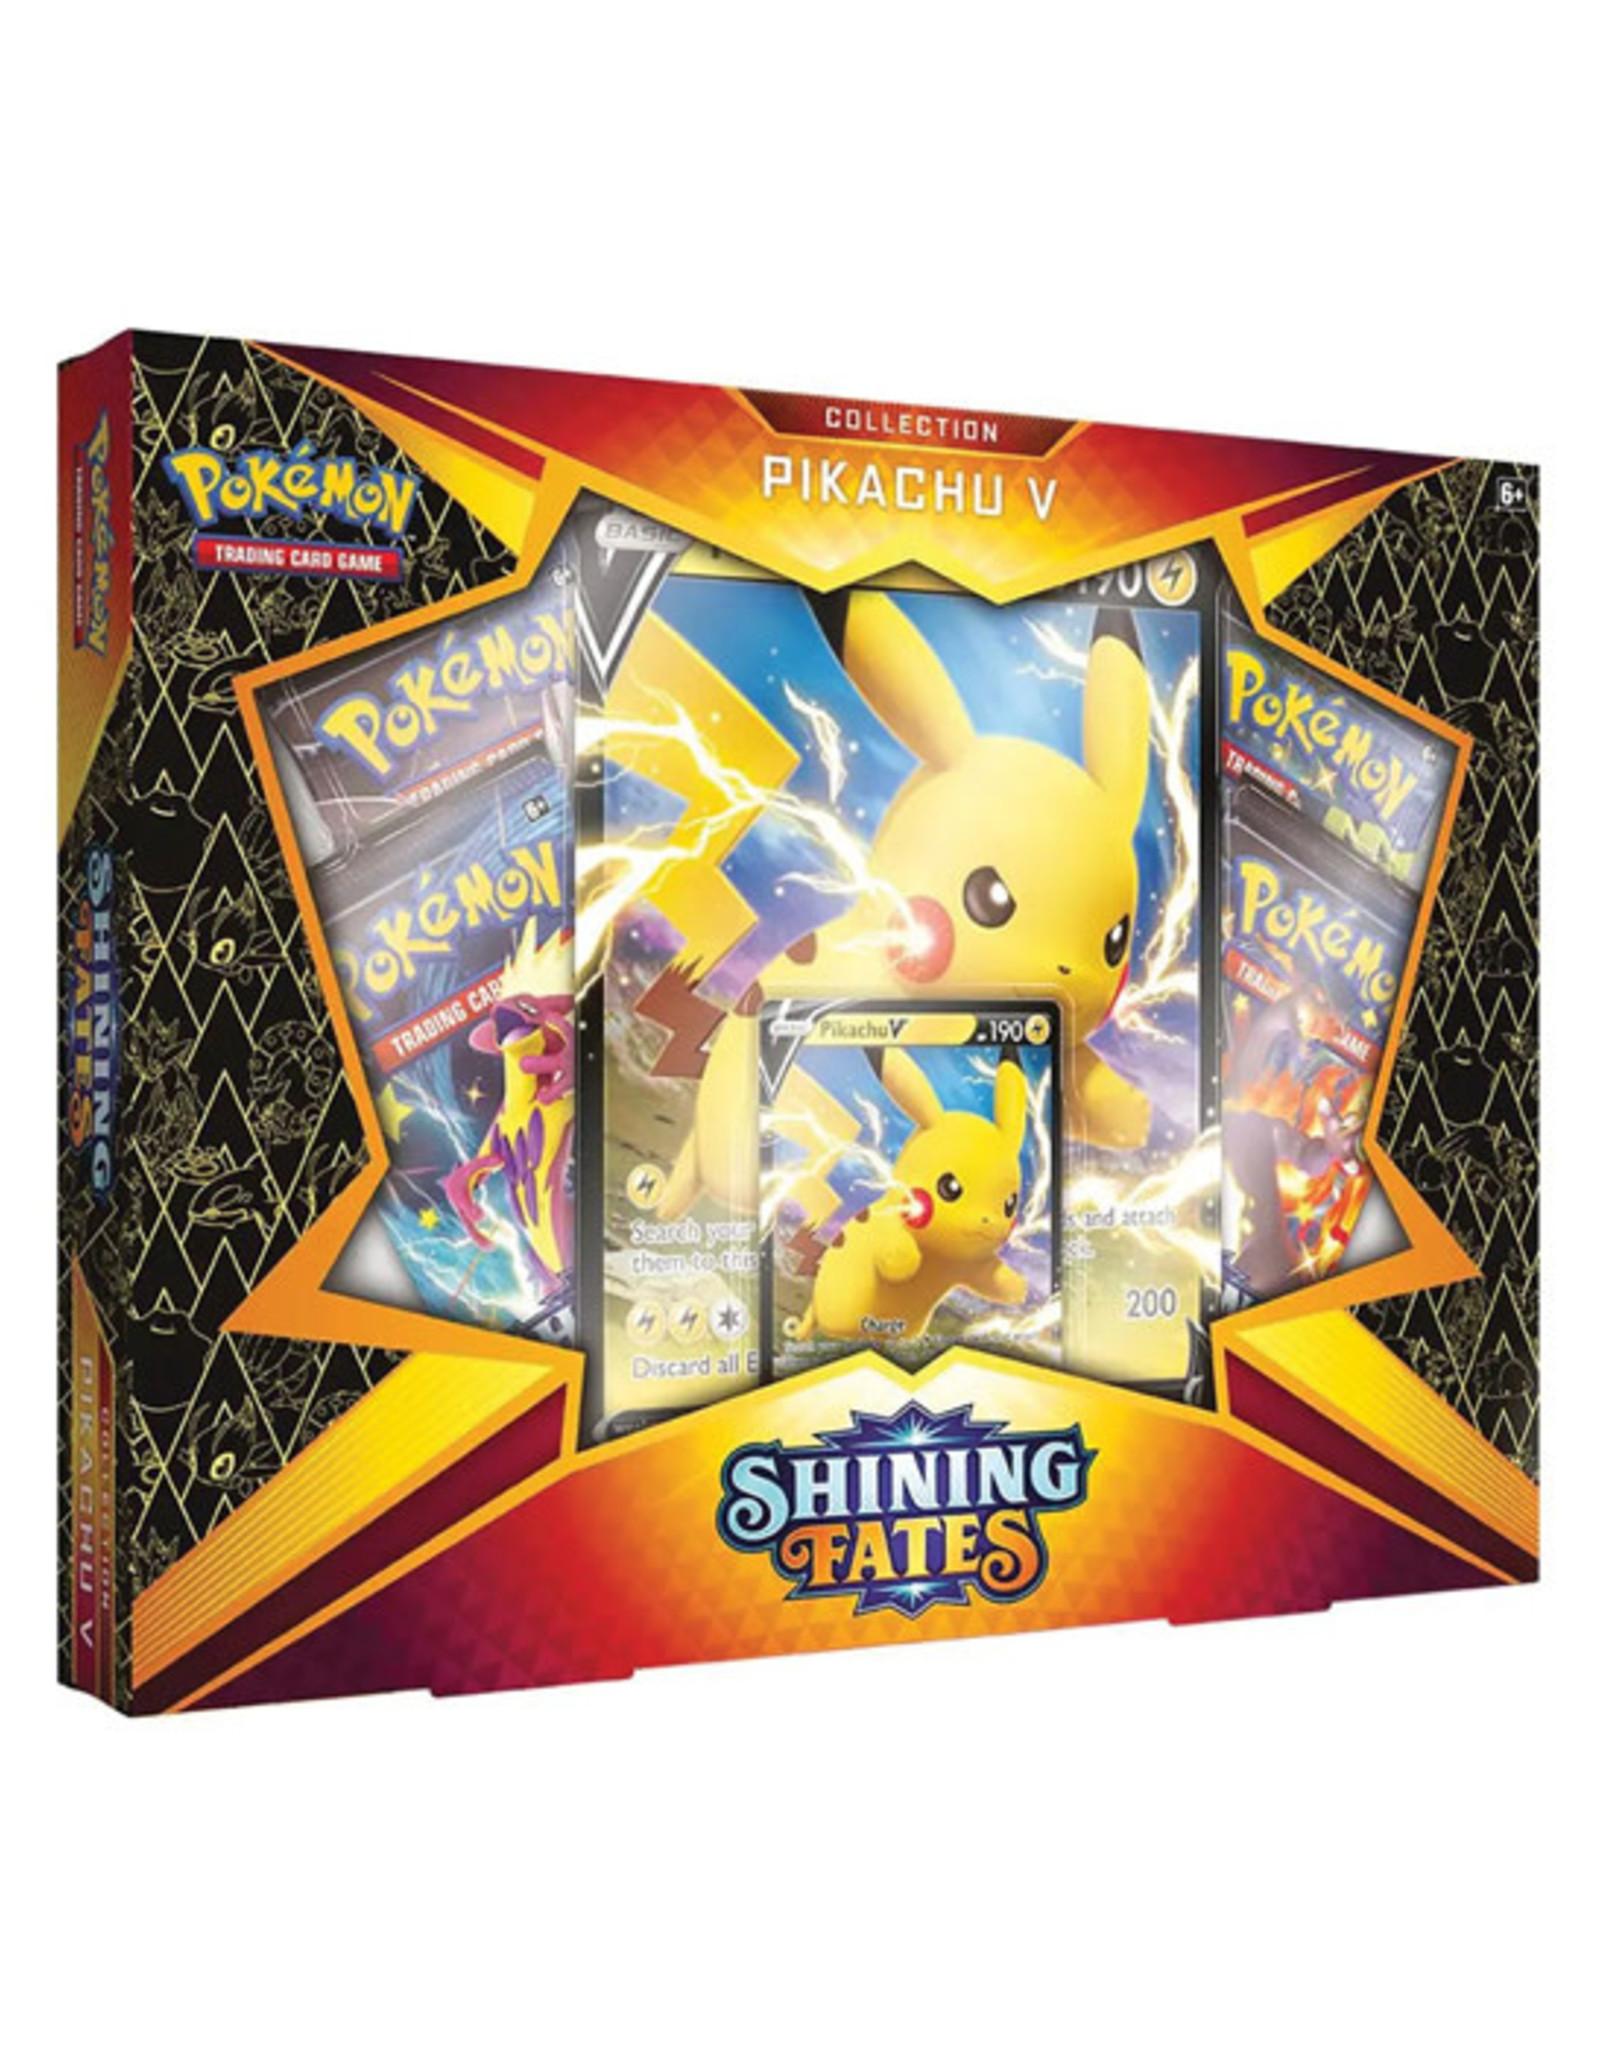 Pokemon Pokemon: Shining Fates - Collection - Pikachu V